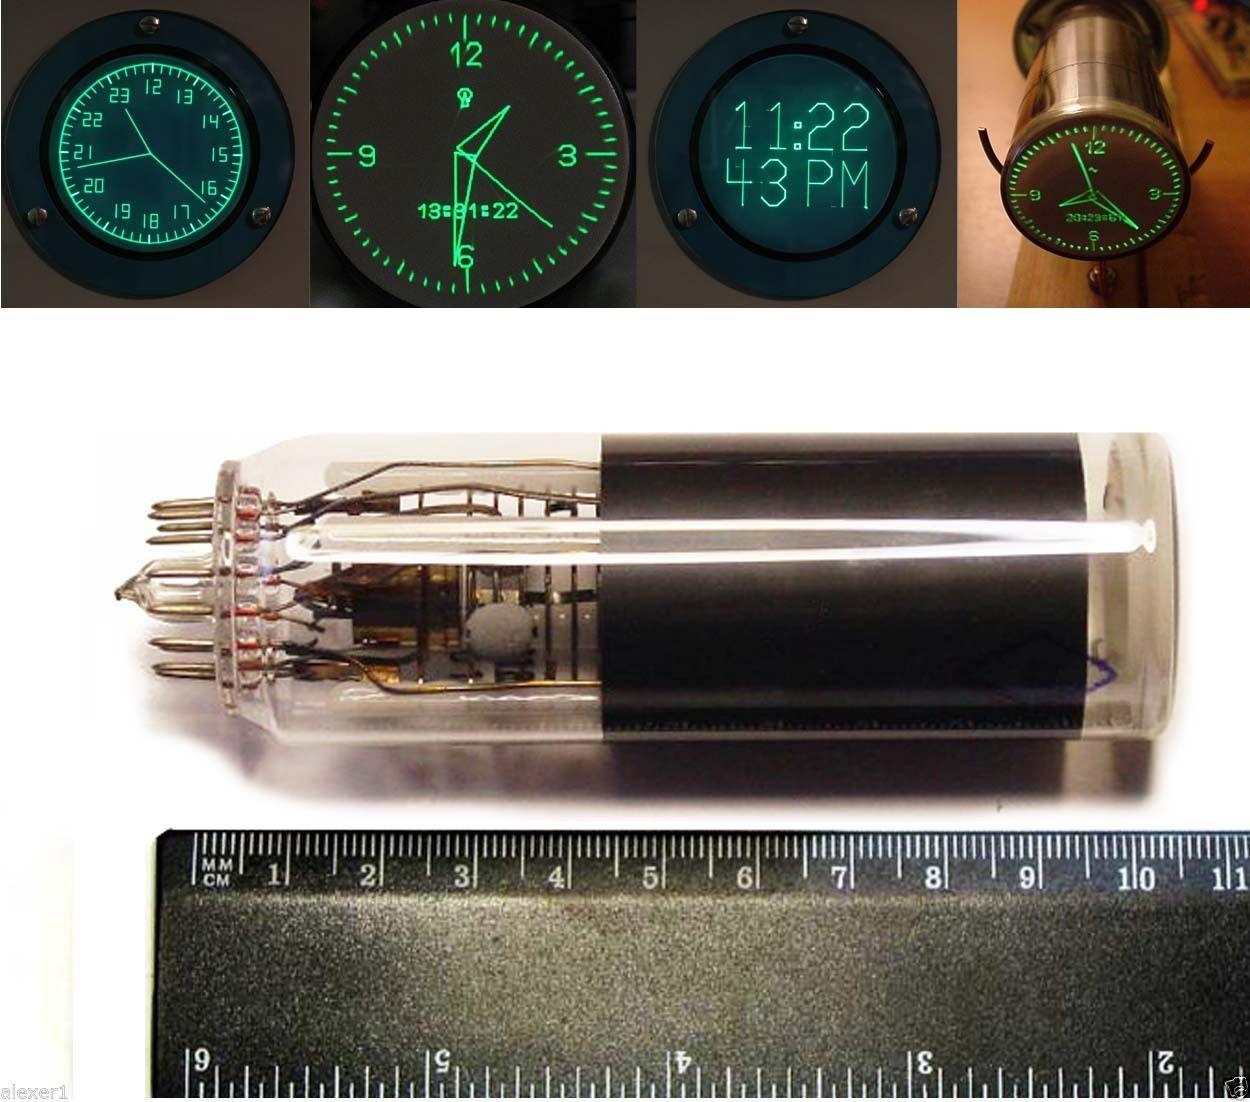 3lo1i Russian Mini Crt Oscilloscope Cathode Ray Tube New In Box